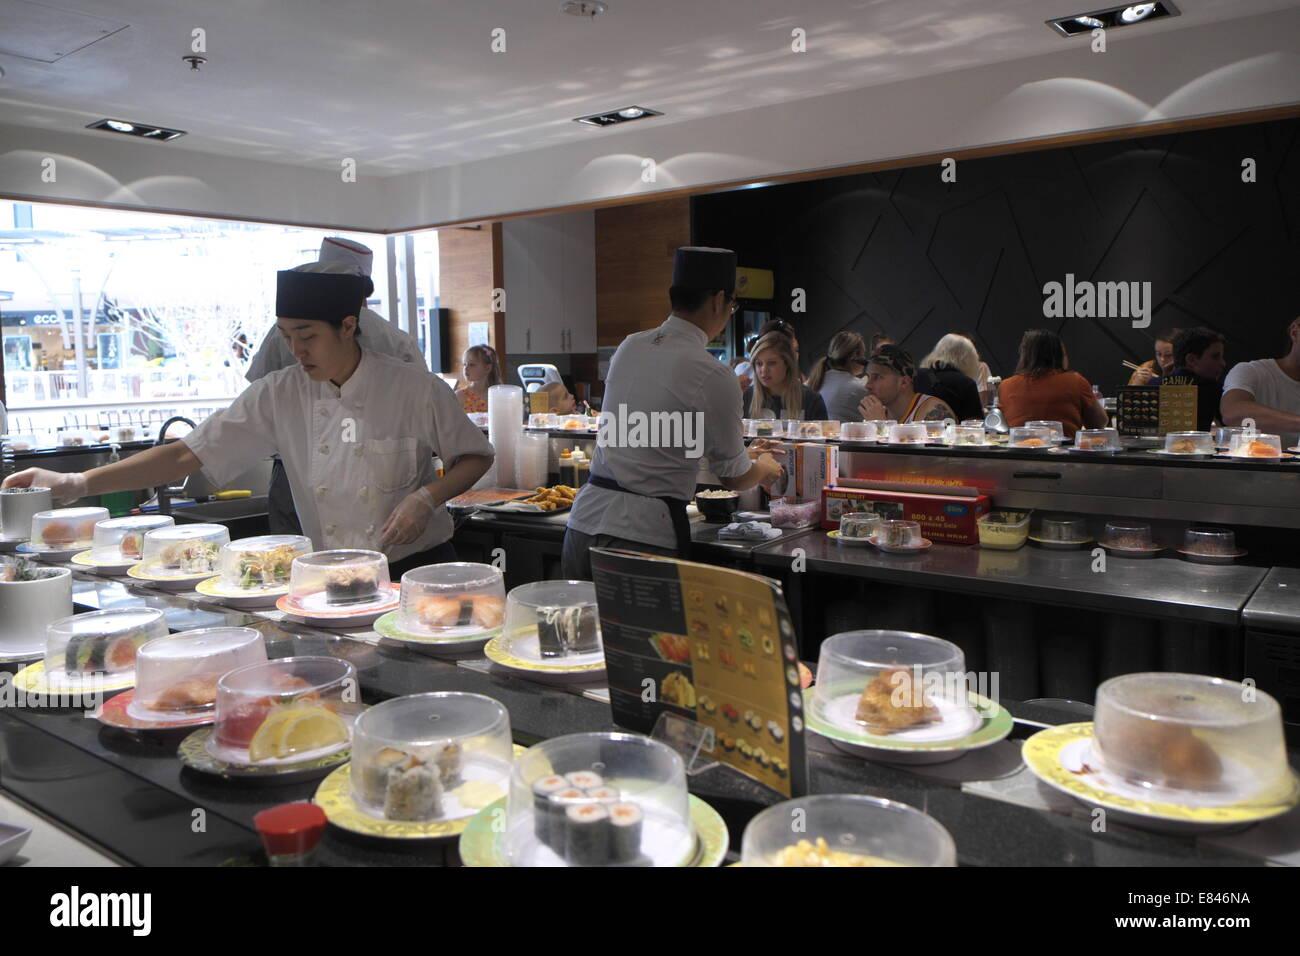 Japanese Restaurant Selling Sushi On A Train Revolving